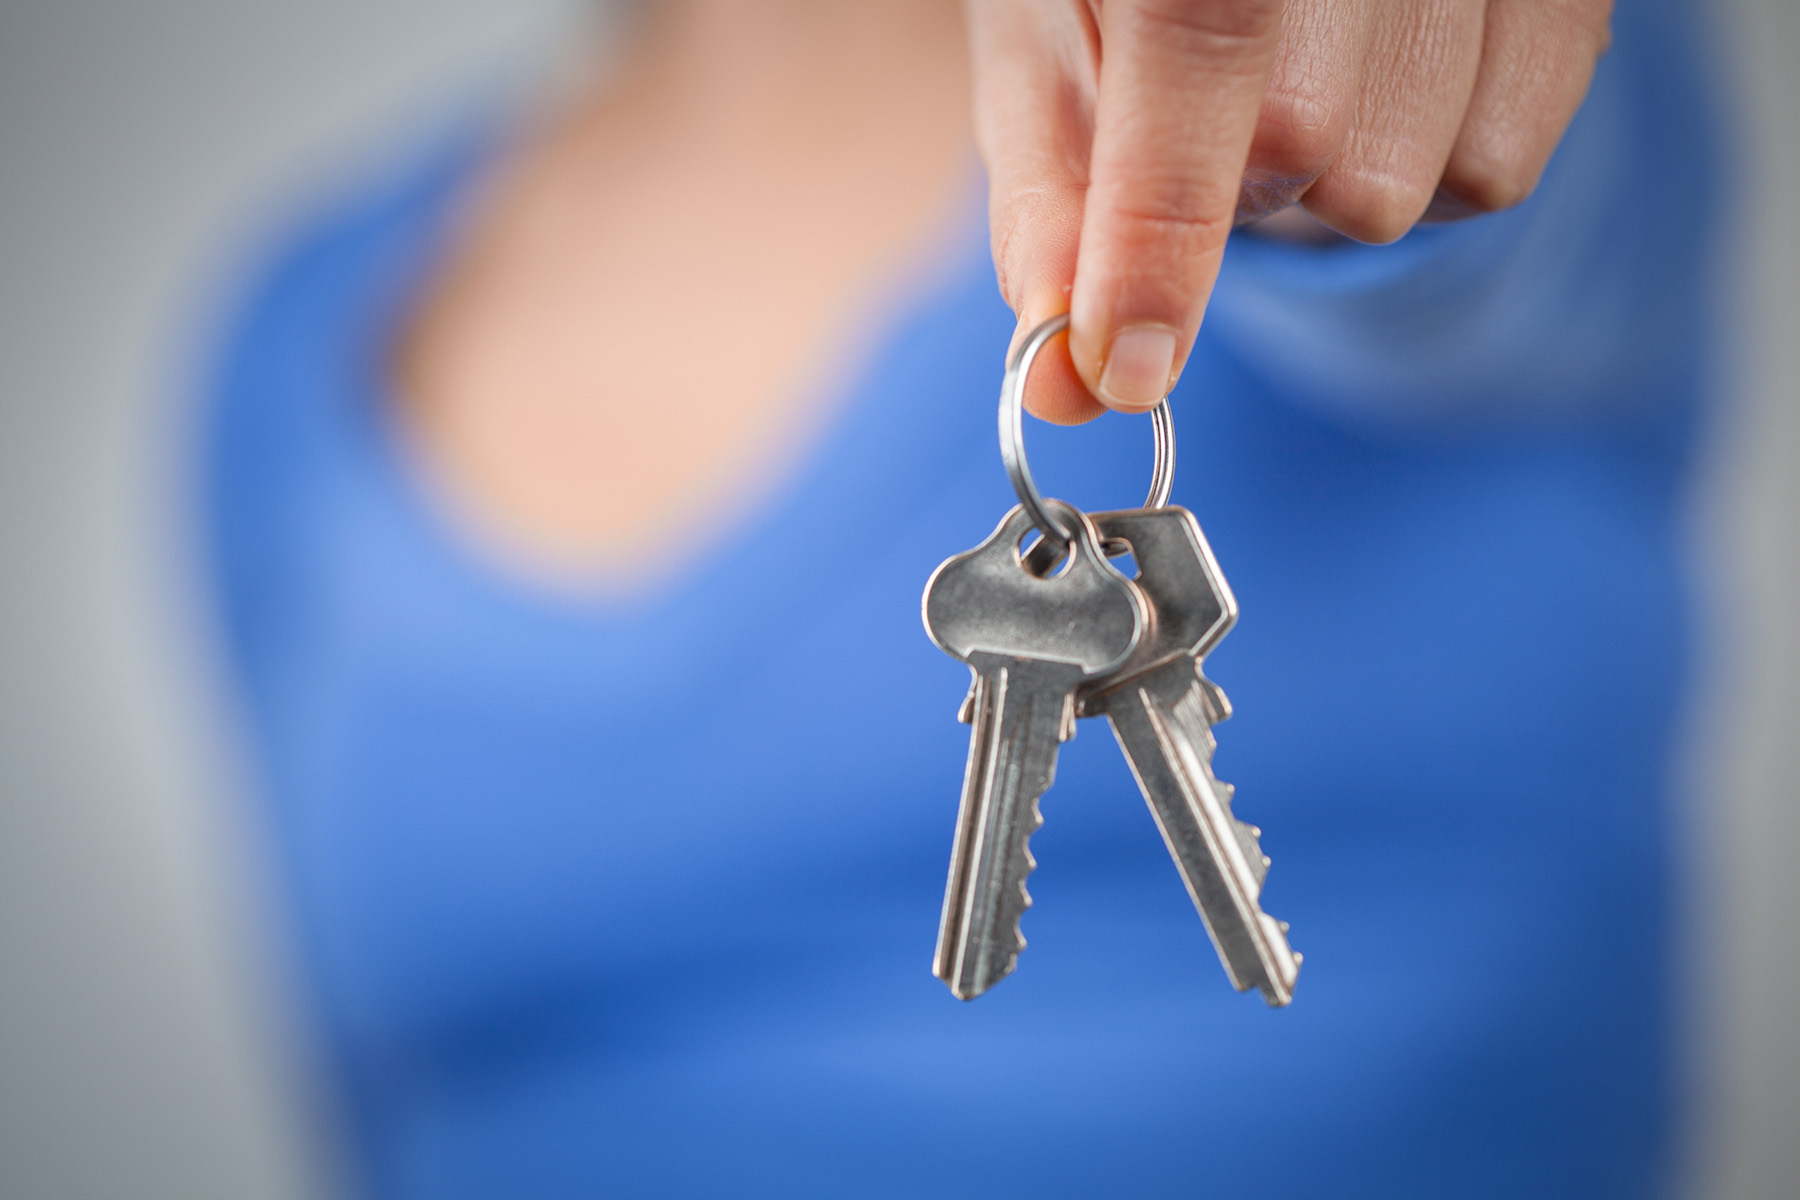 Spare house keys